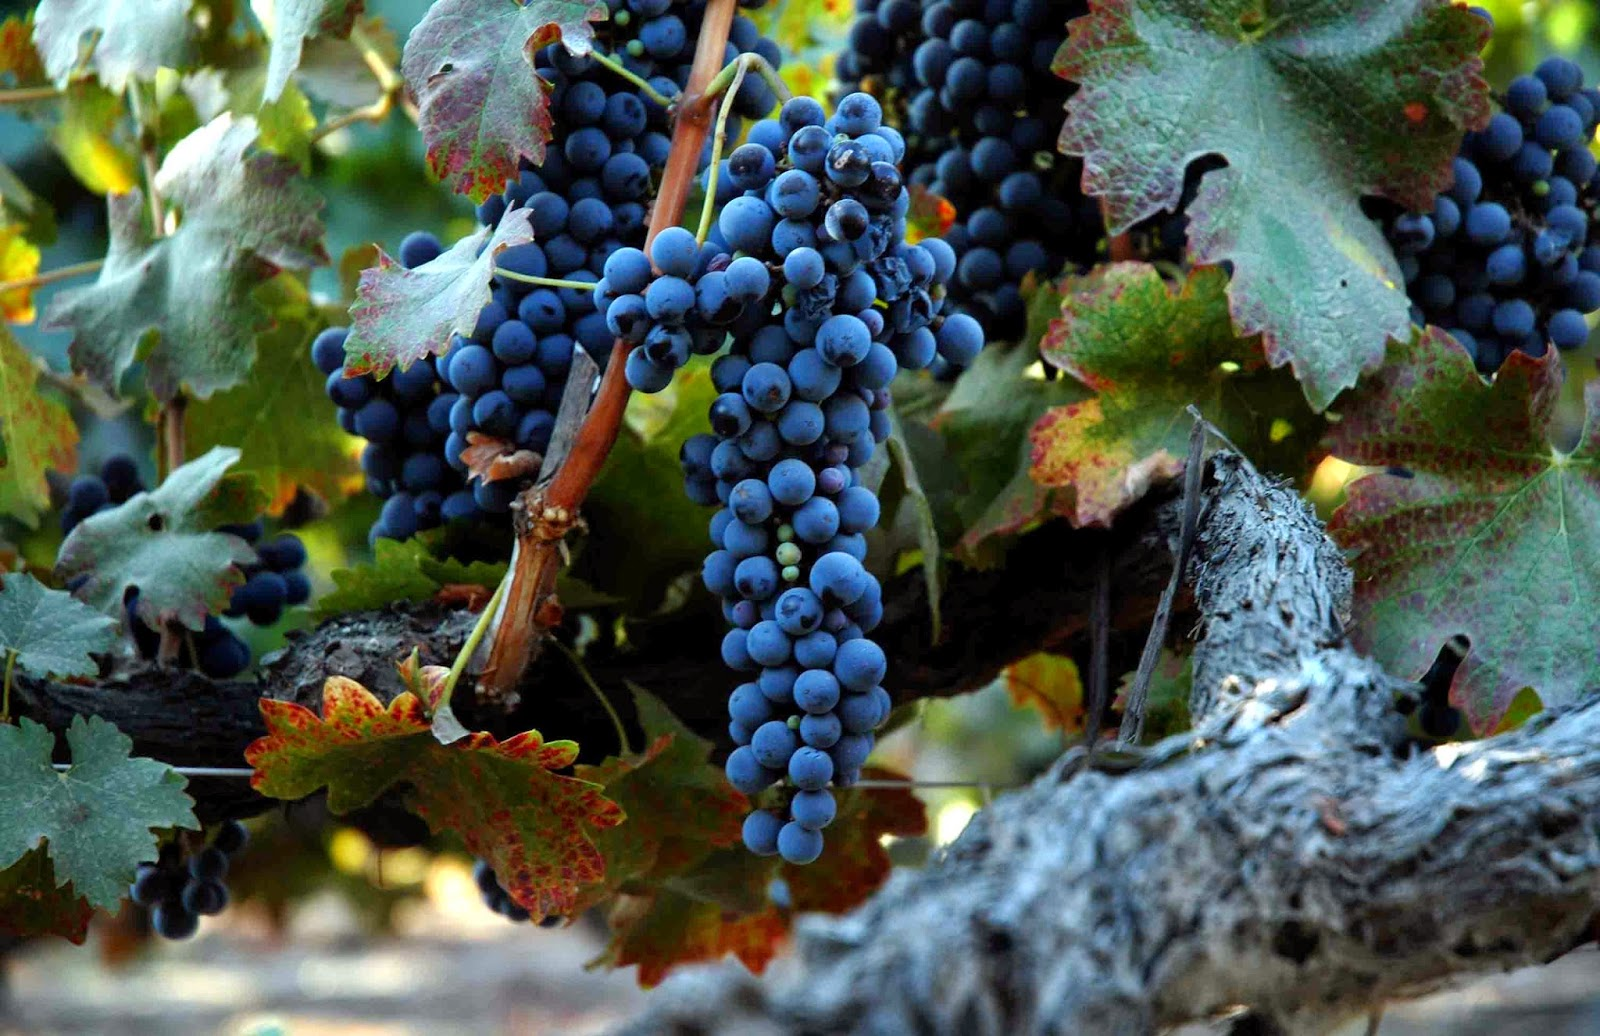 Wino 4 Life: Get to Know your Grapes Series - Syrah a.k.a. Shiraz